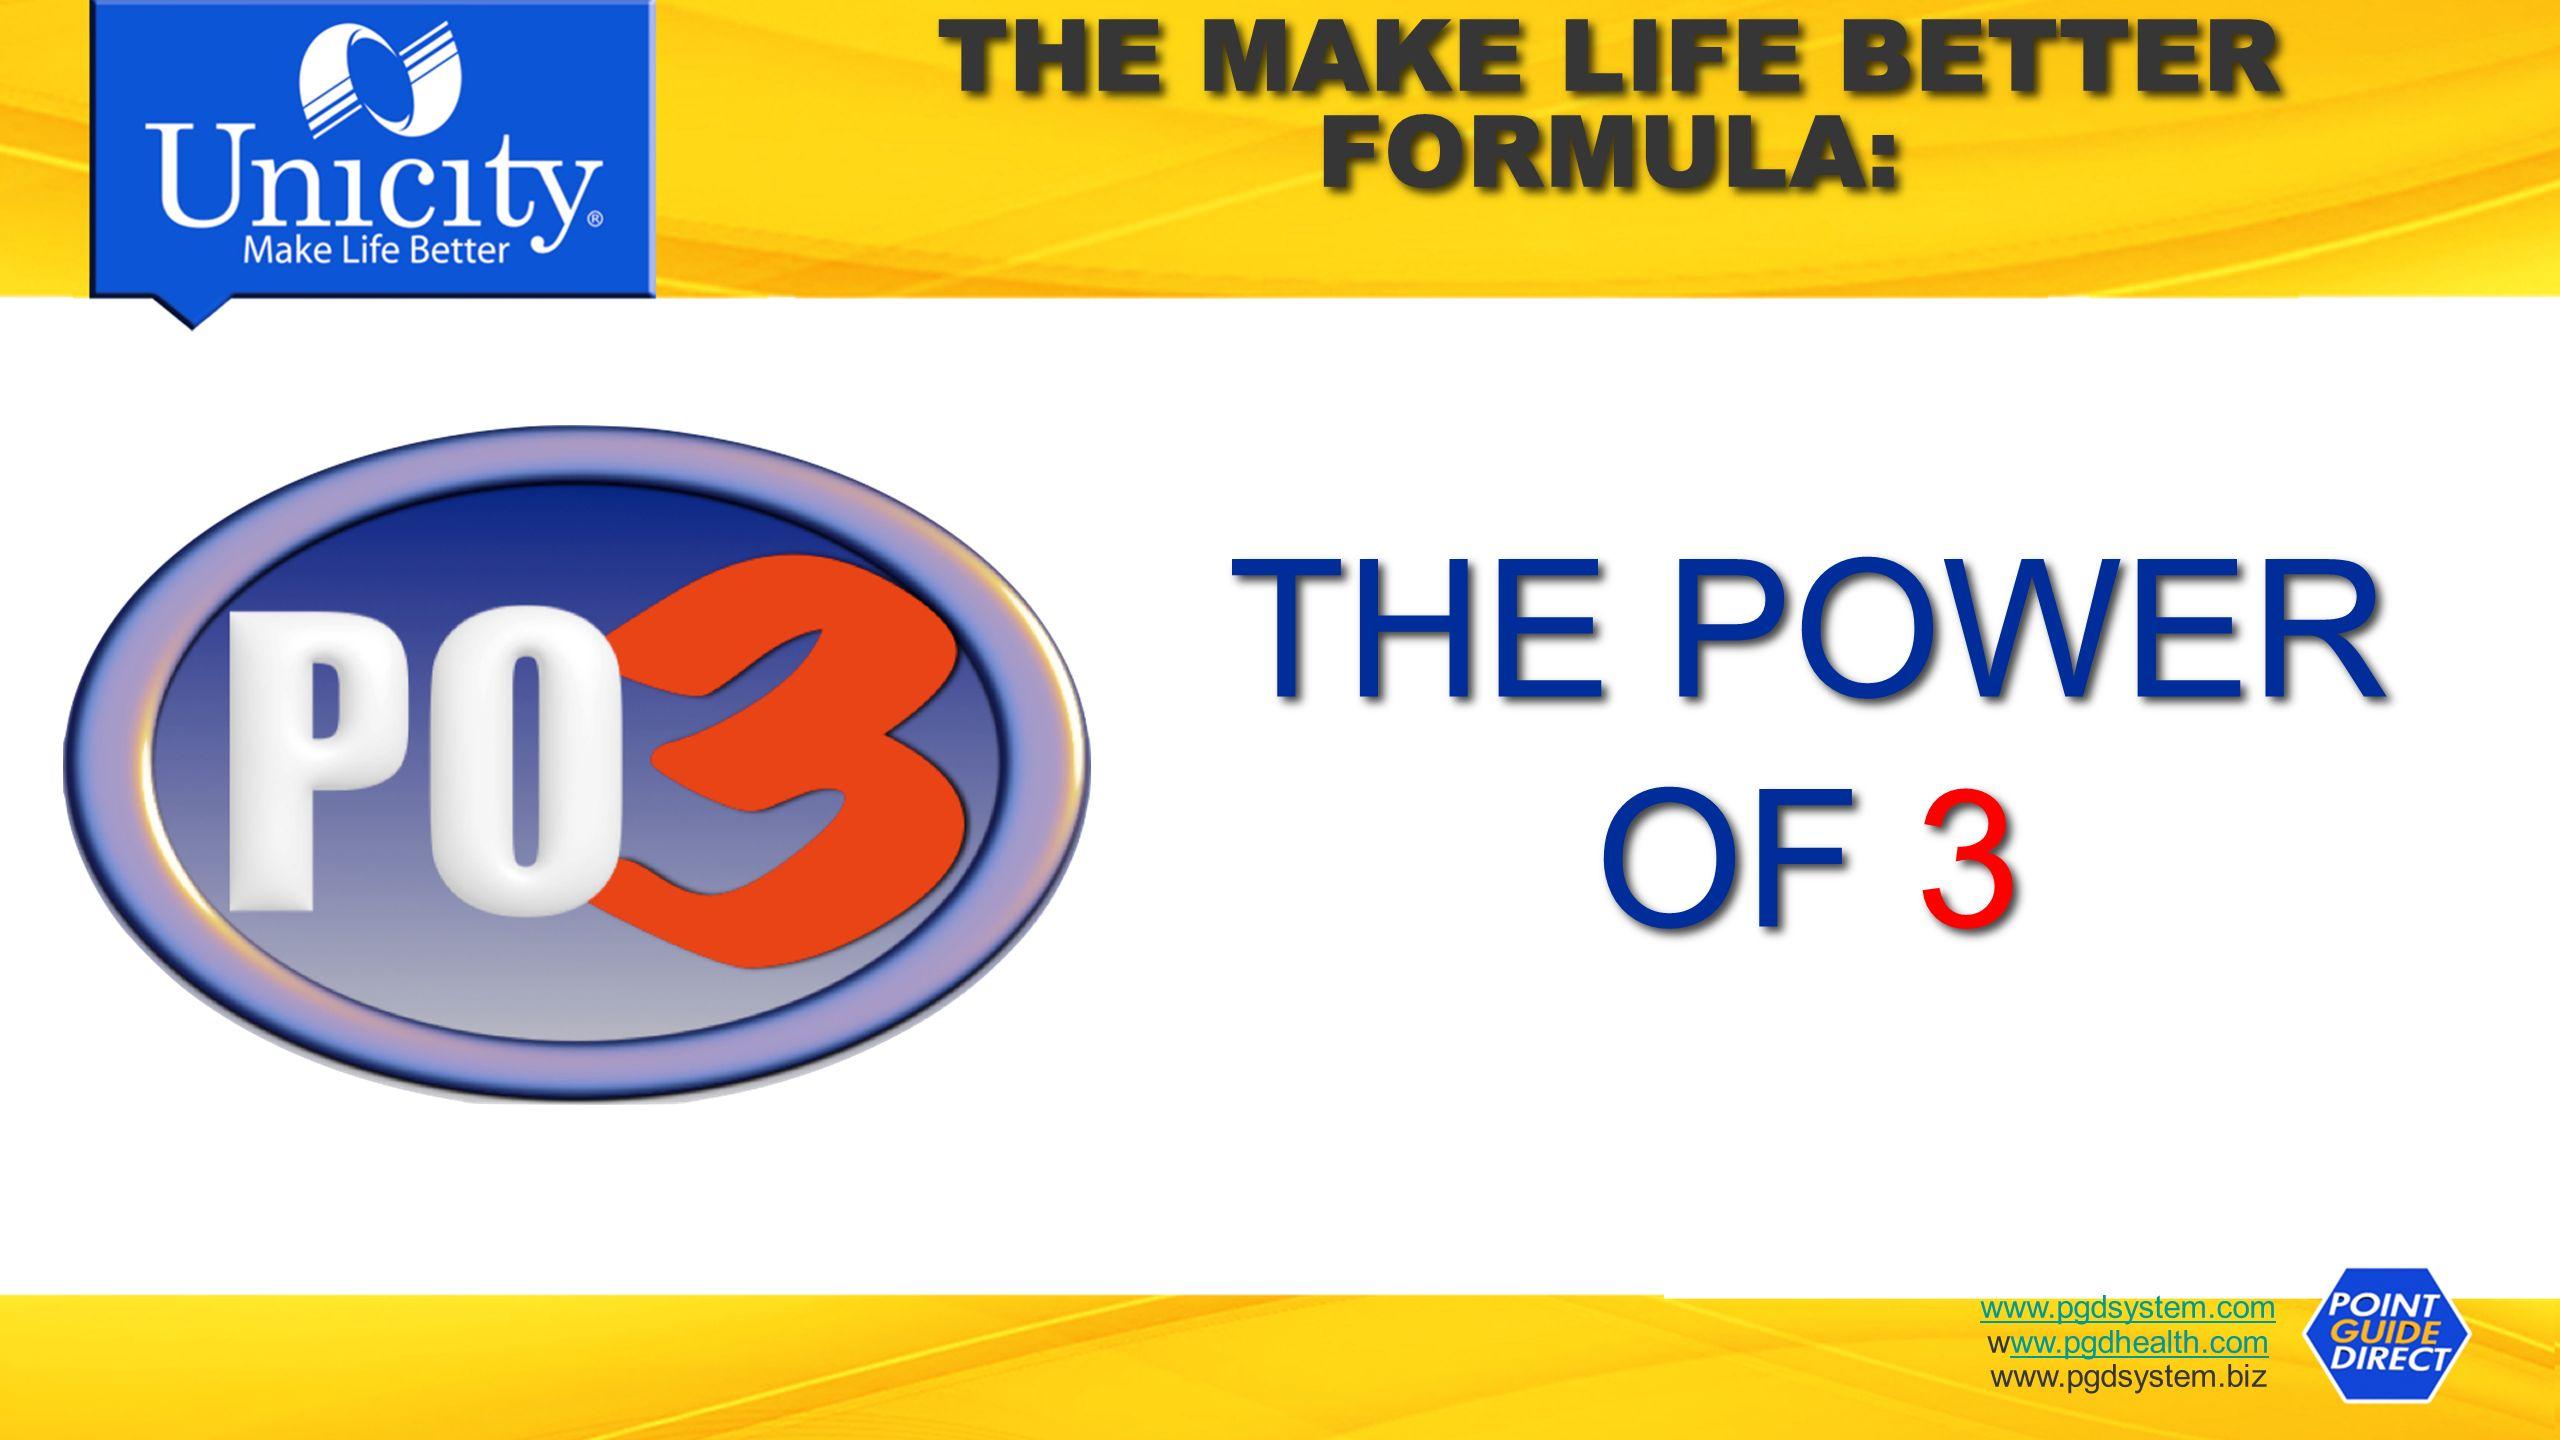 www.pgdsystem.com www.pgdhealth.comww.pgdhealth.com www.pgdsystem.biz THE POWER OF 3 THE POWER OF 3 THE MAKE LIFE BETTER FORMULA: